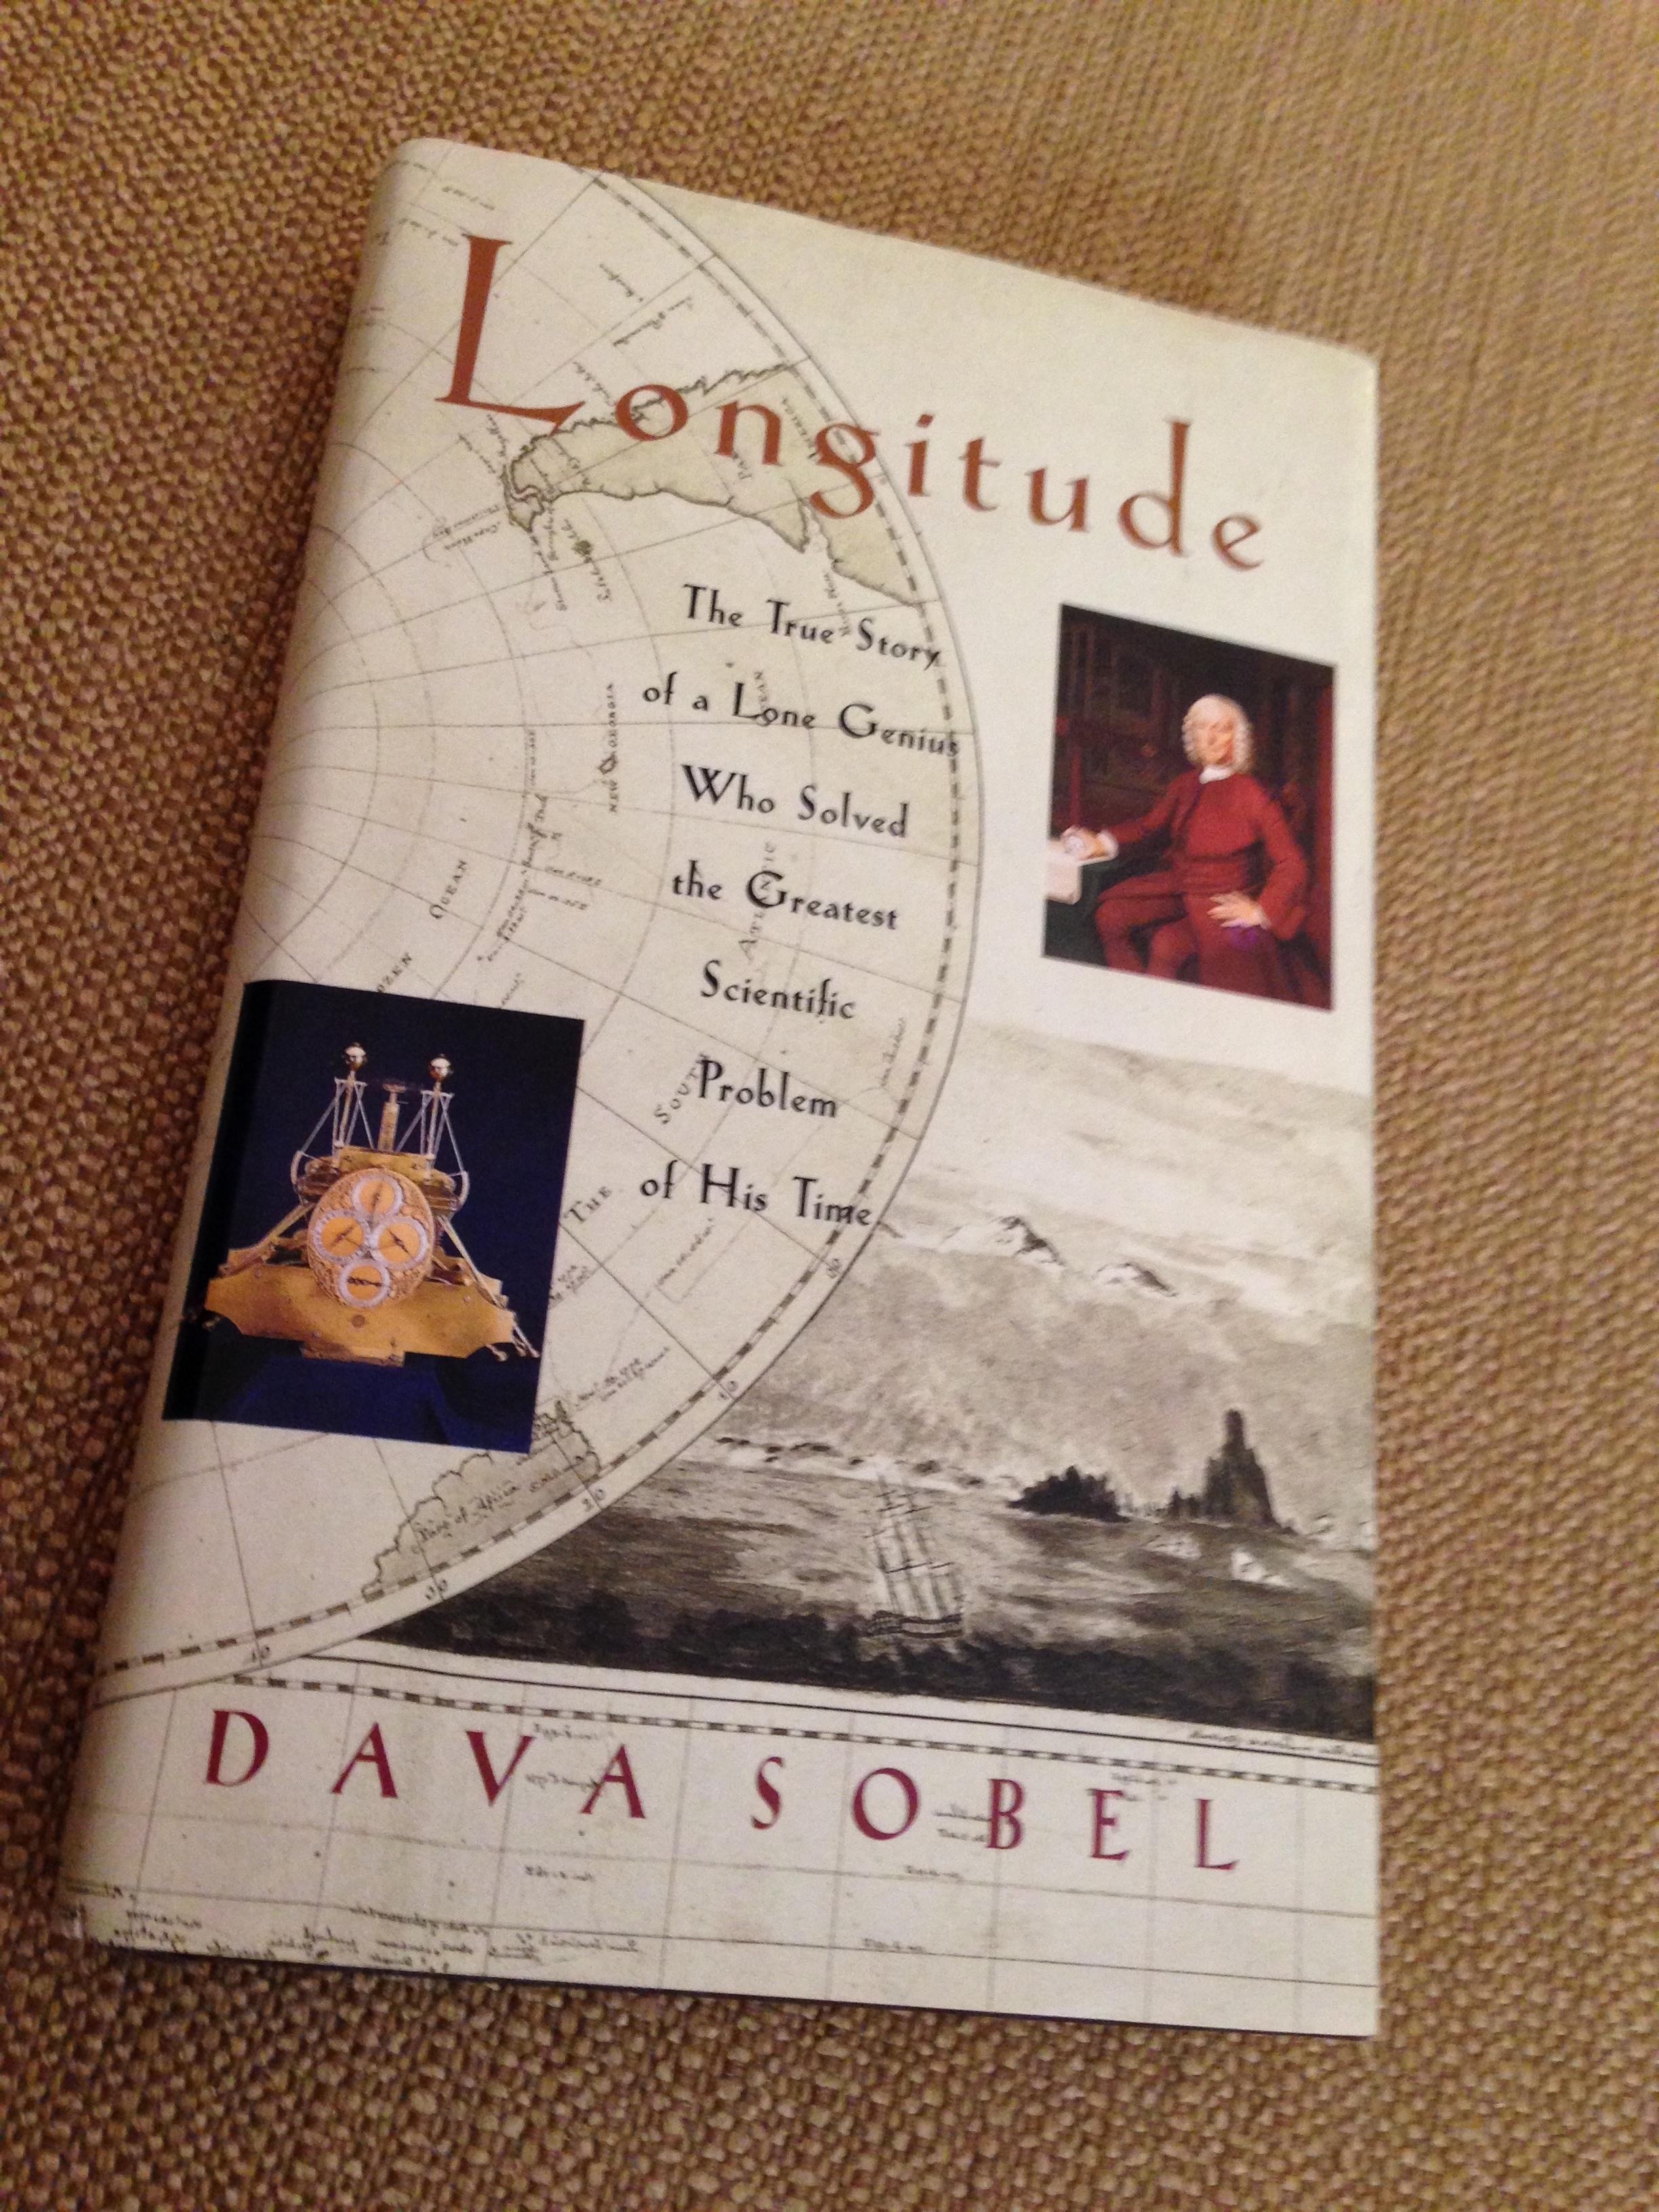 longitude dava sobel Find great deals on ebay for longitude dava sobel shop with confidence.